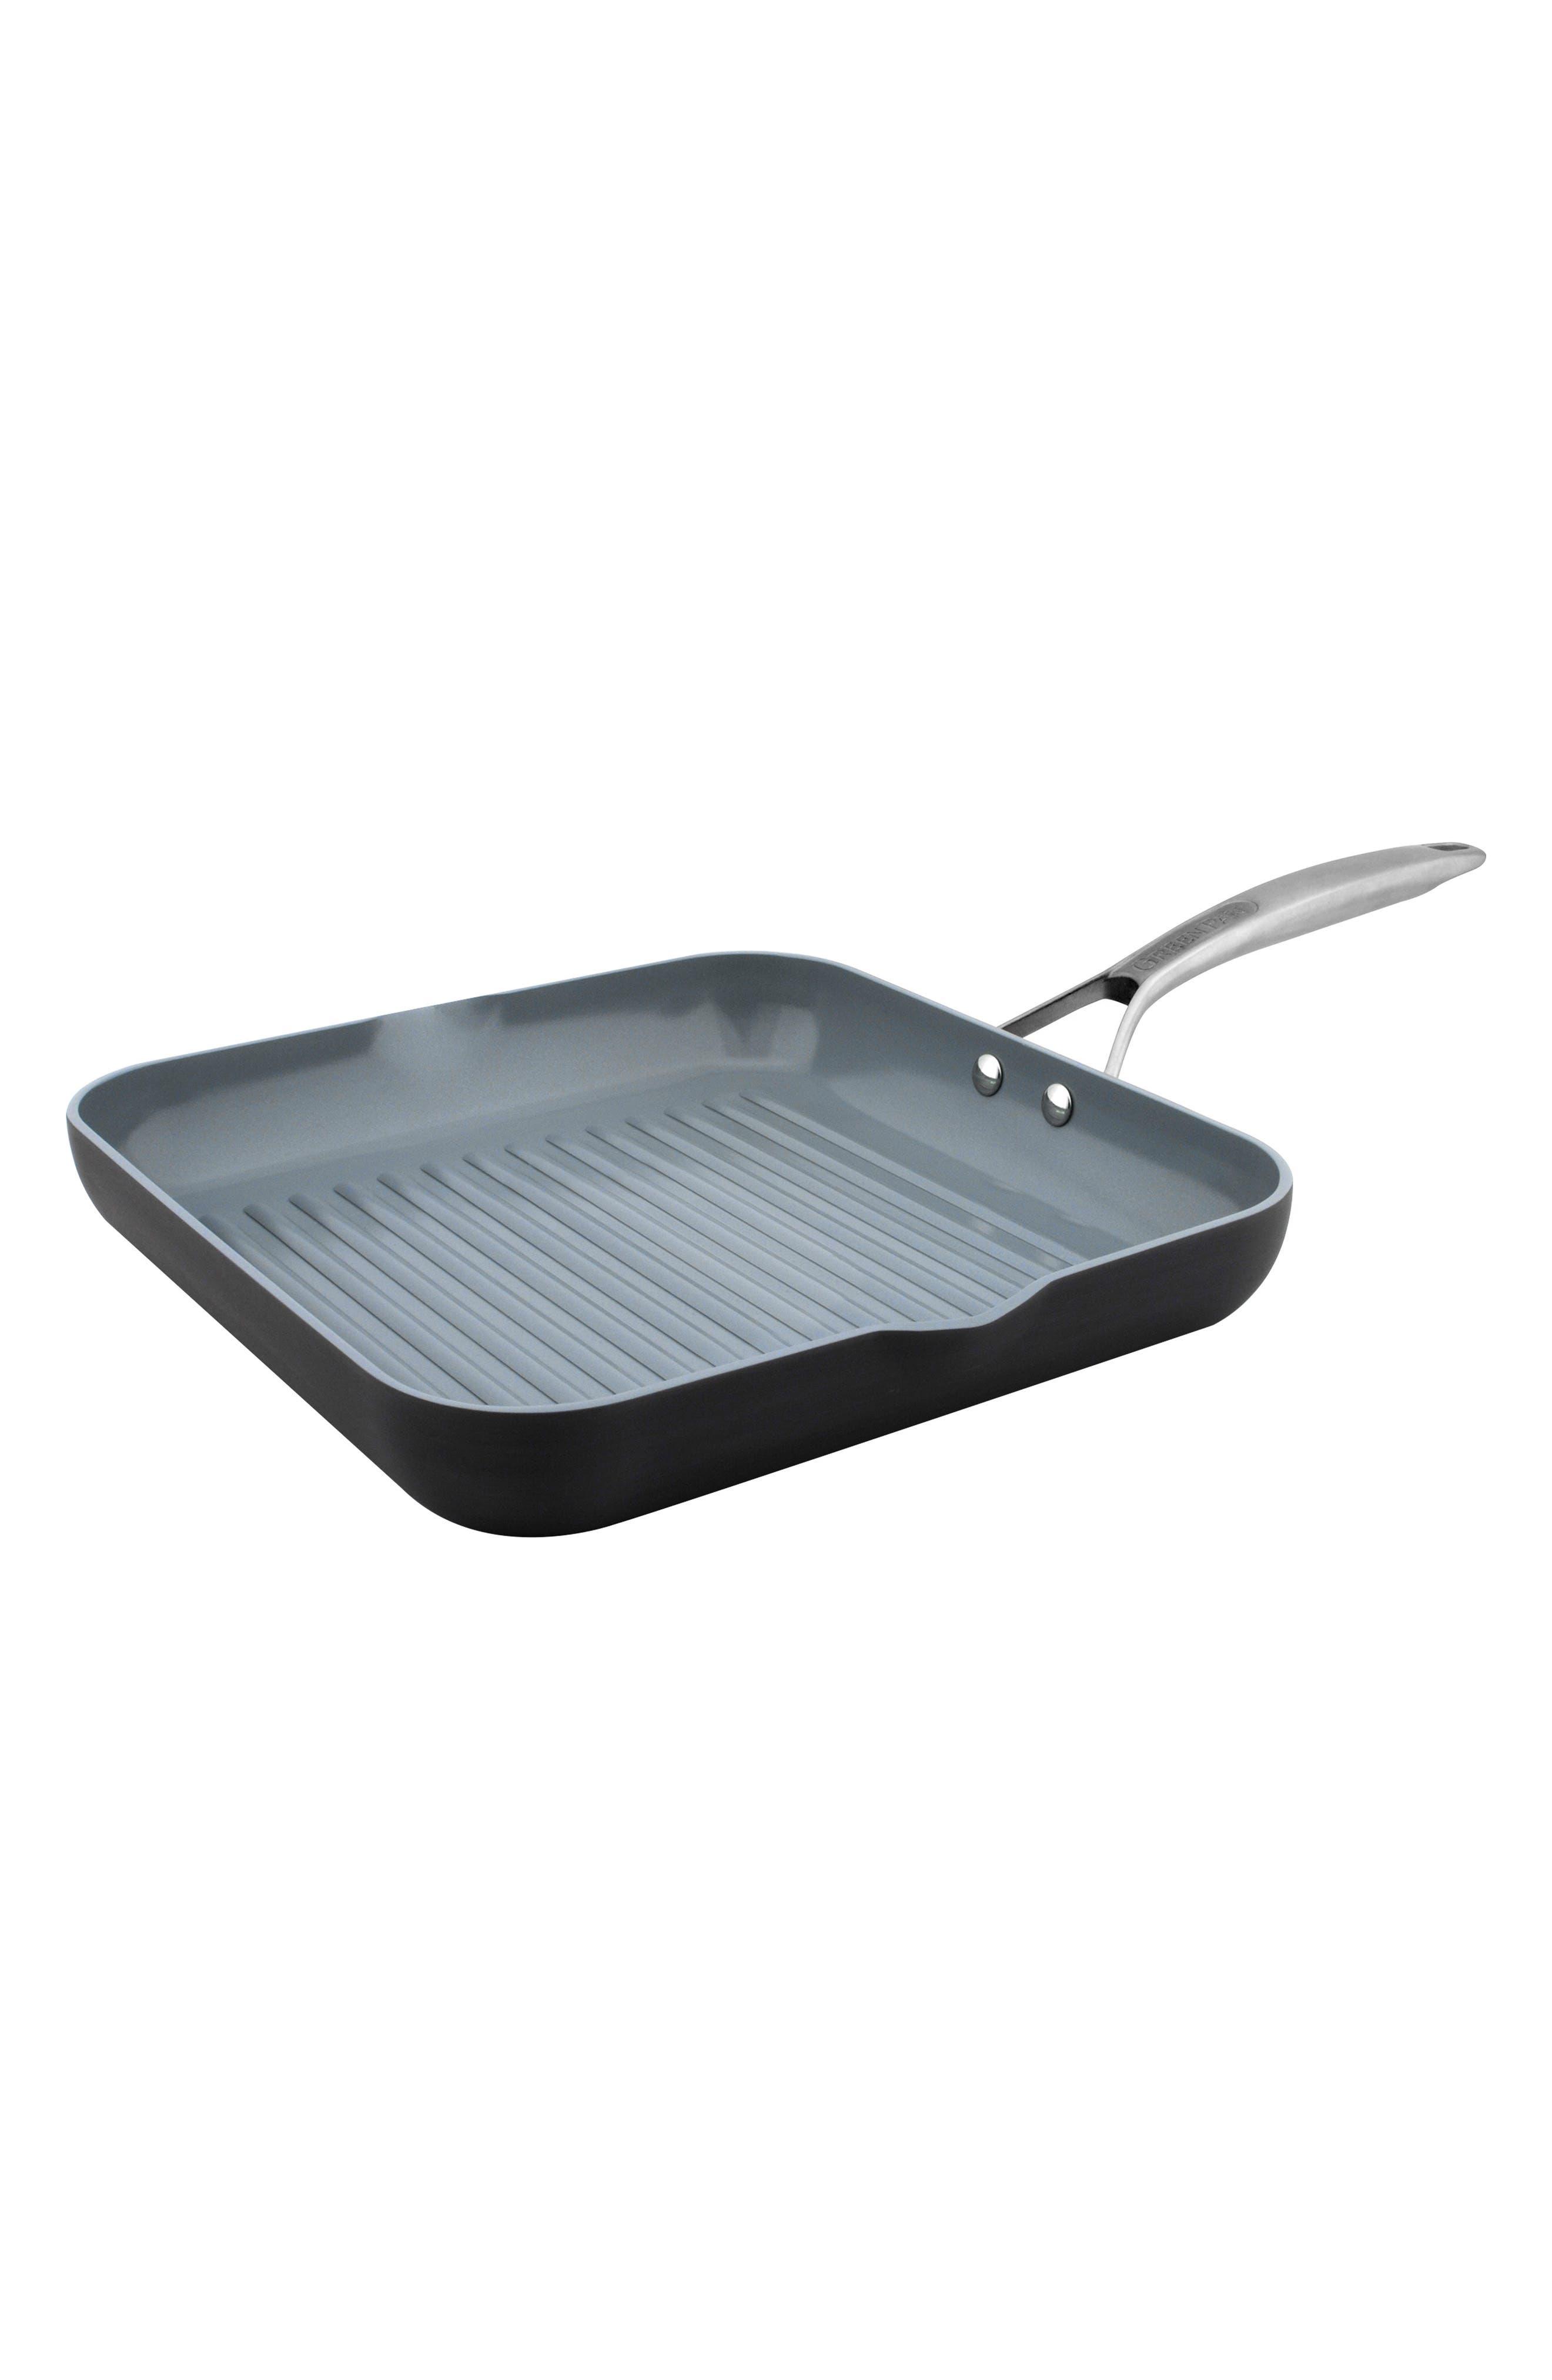 Paris 11-Inch Anodized Aluminum Ceramic Nonstick Grill Pan,                             Main thumbnail 1, color,                             Grey